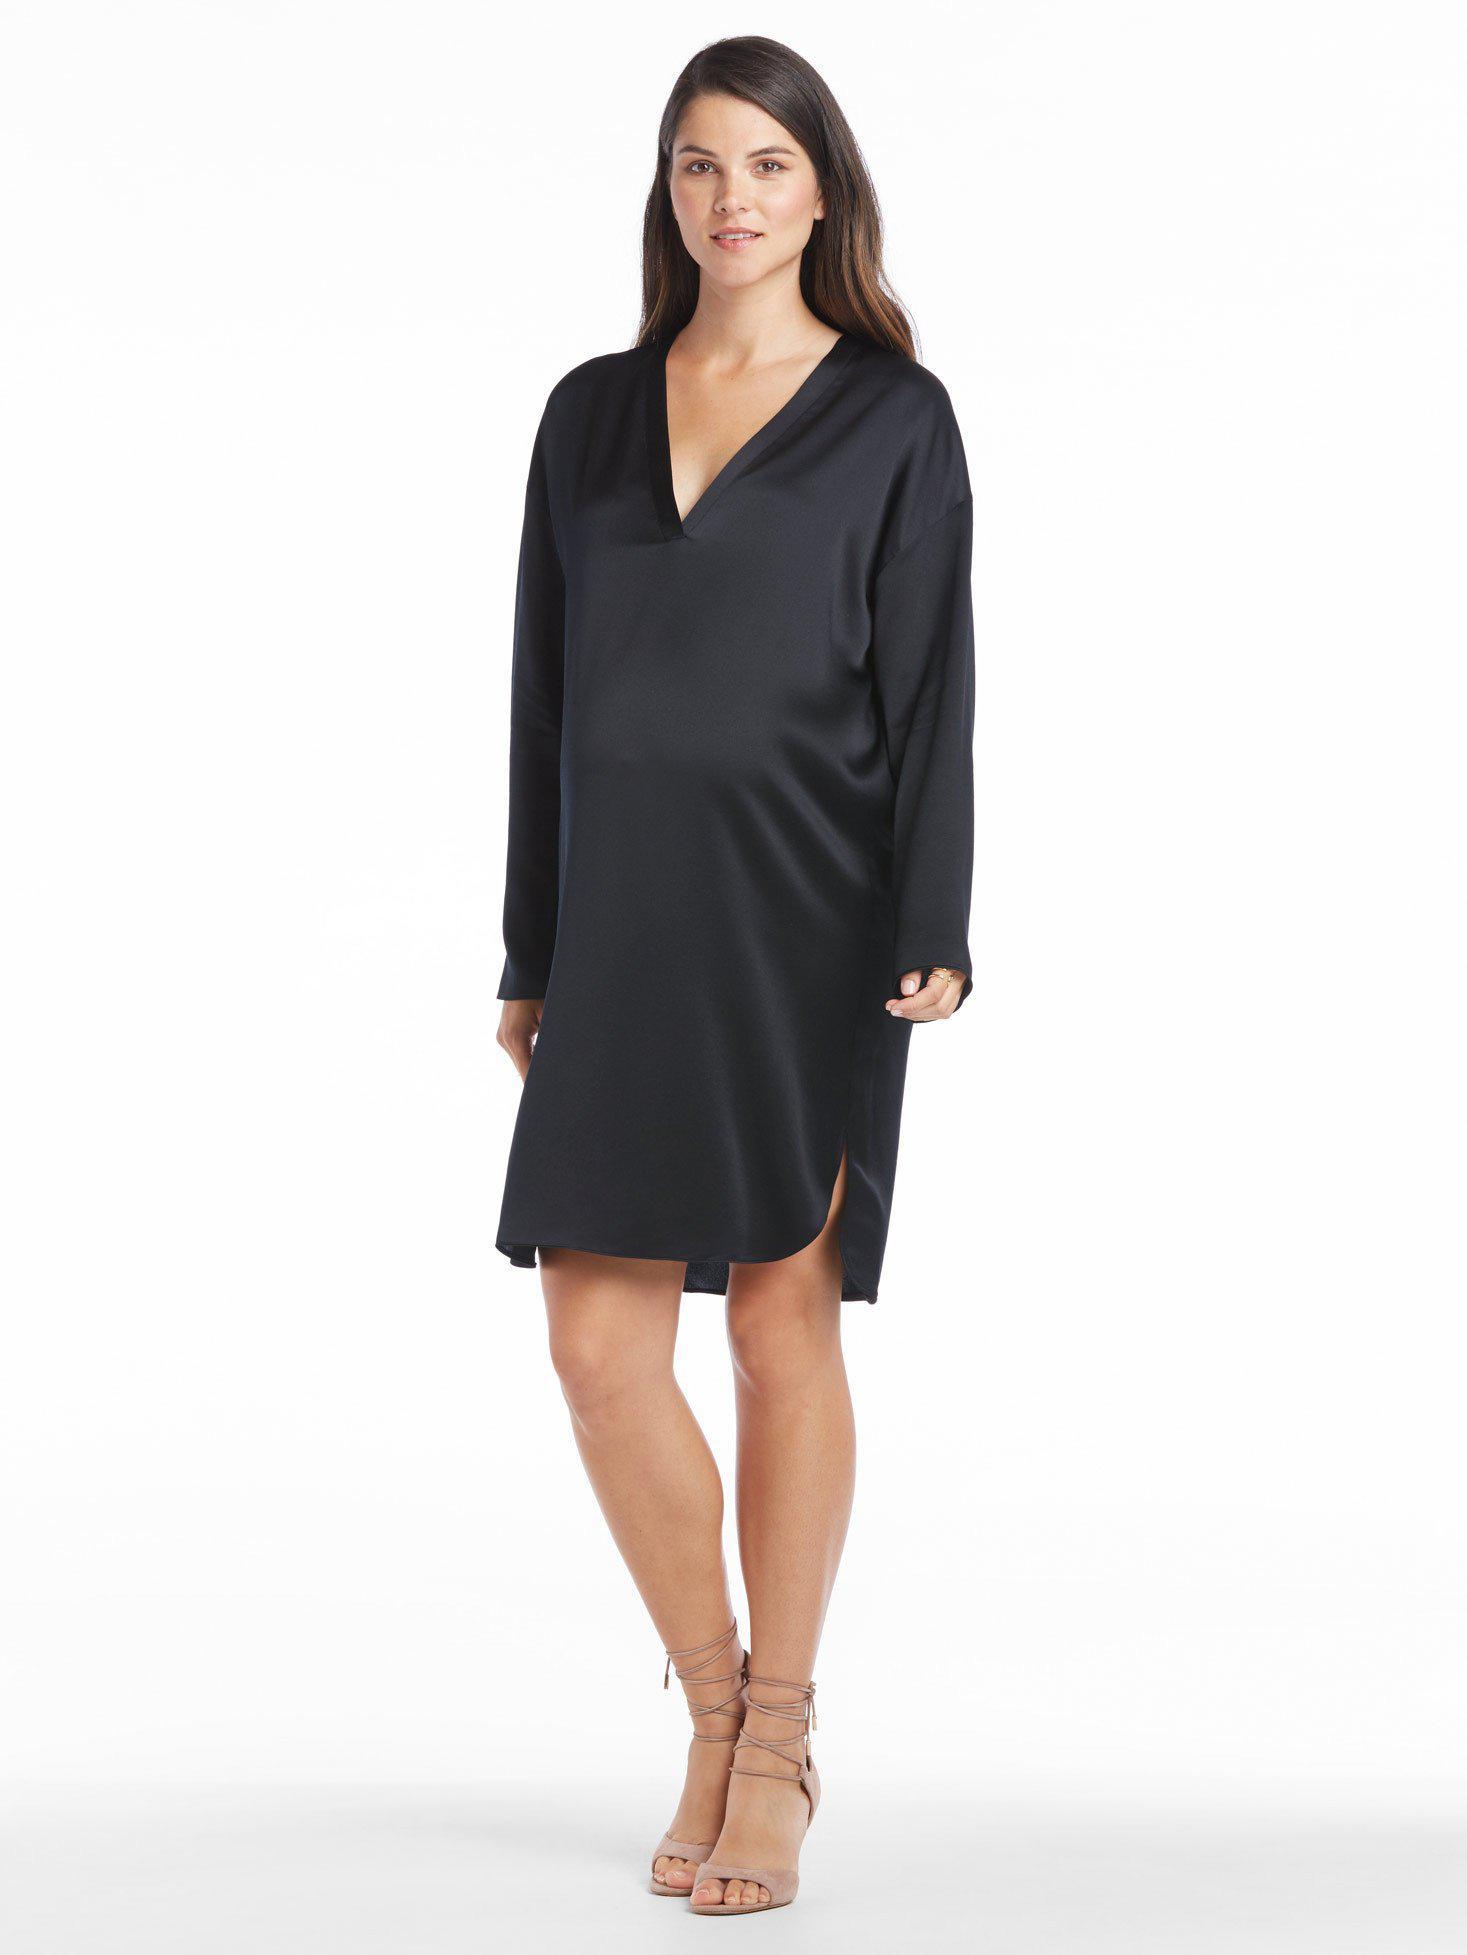 8677f00f728488 Lyst - Vince Satin V-neck Tunic Dress in Black